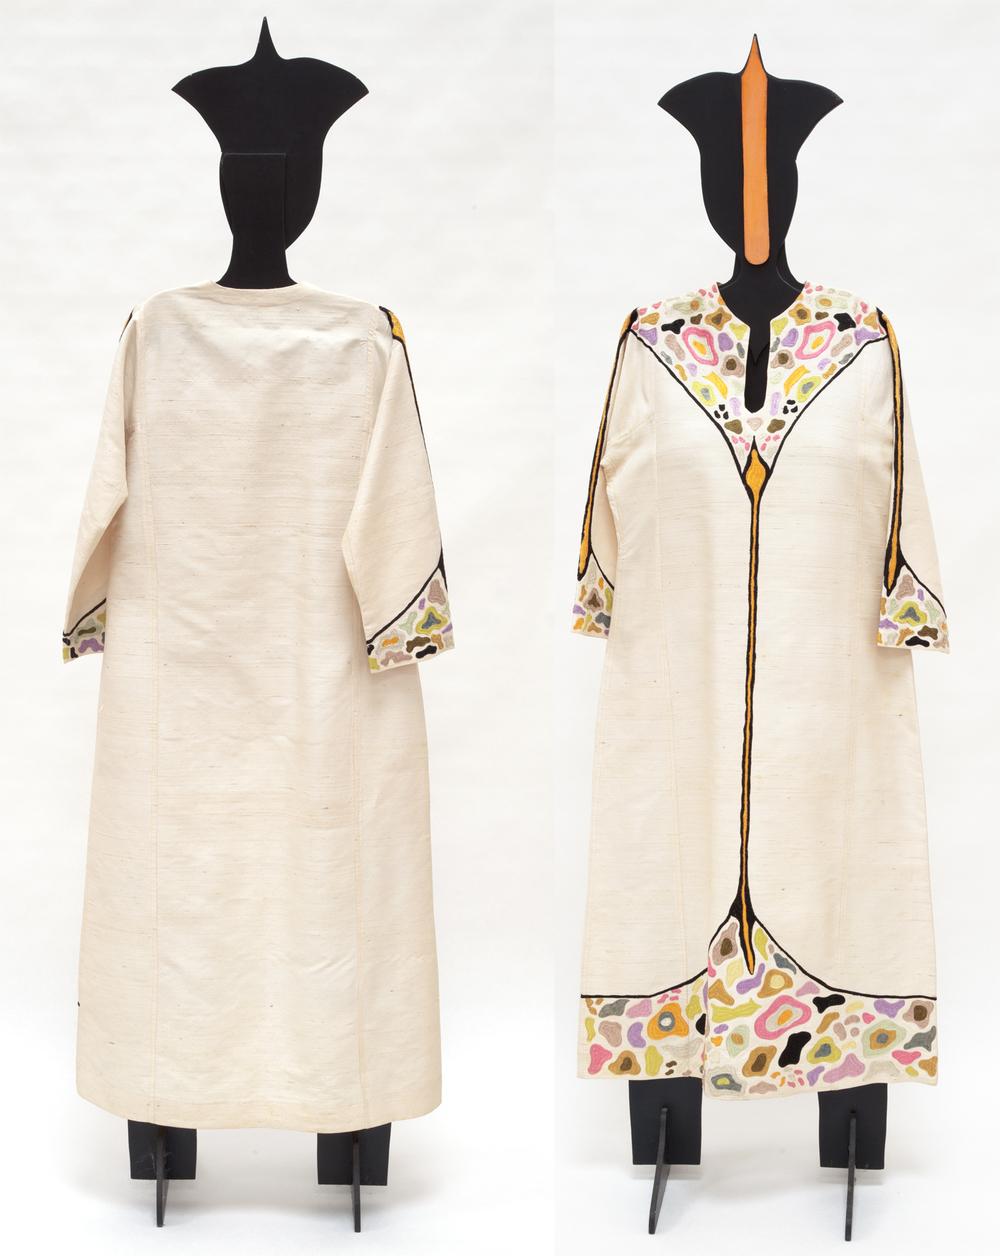 HC_18_1970_The first (dress #1 front & back)_thread on fabric_73x19x12__1970_AB.jpg